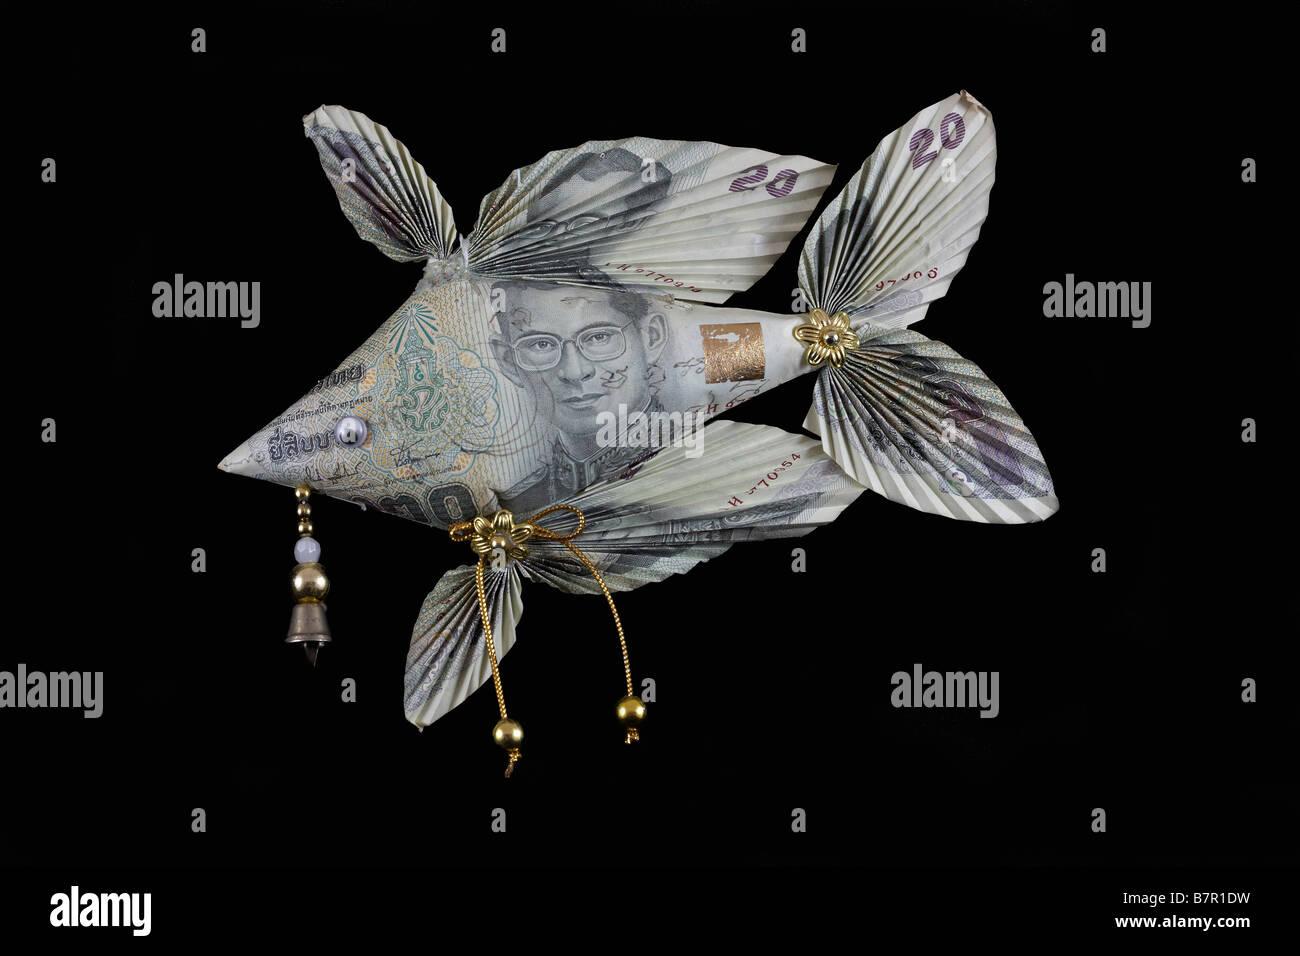 20 Baht Stock Photos & 20 Baht Stock Images - Alamy - photo#33